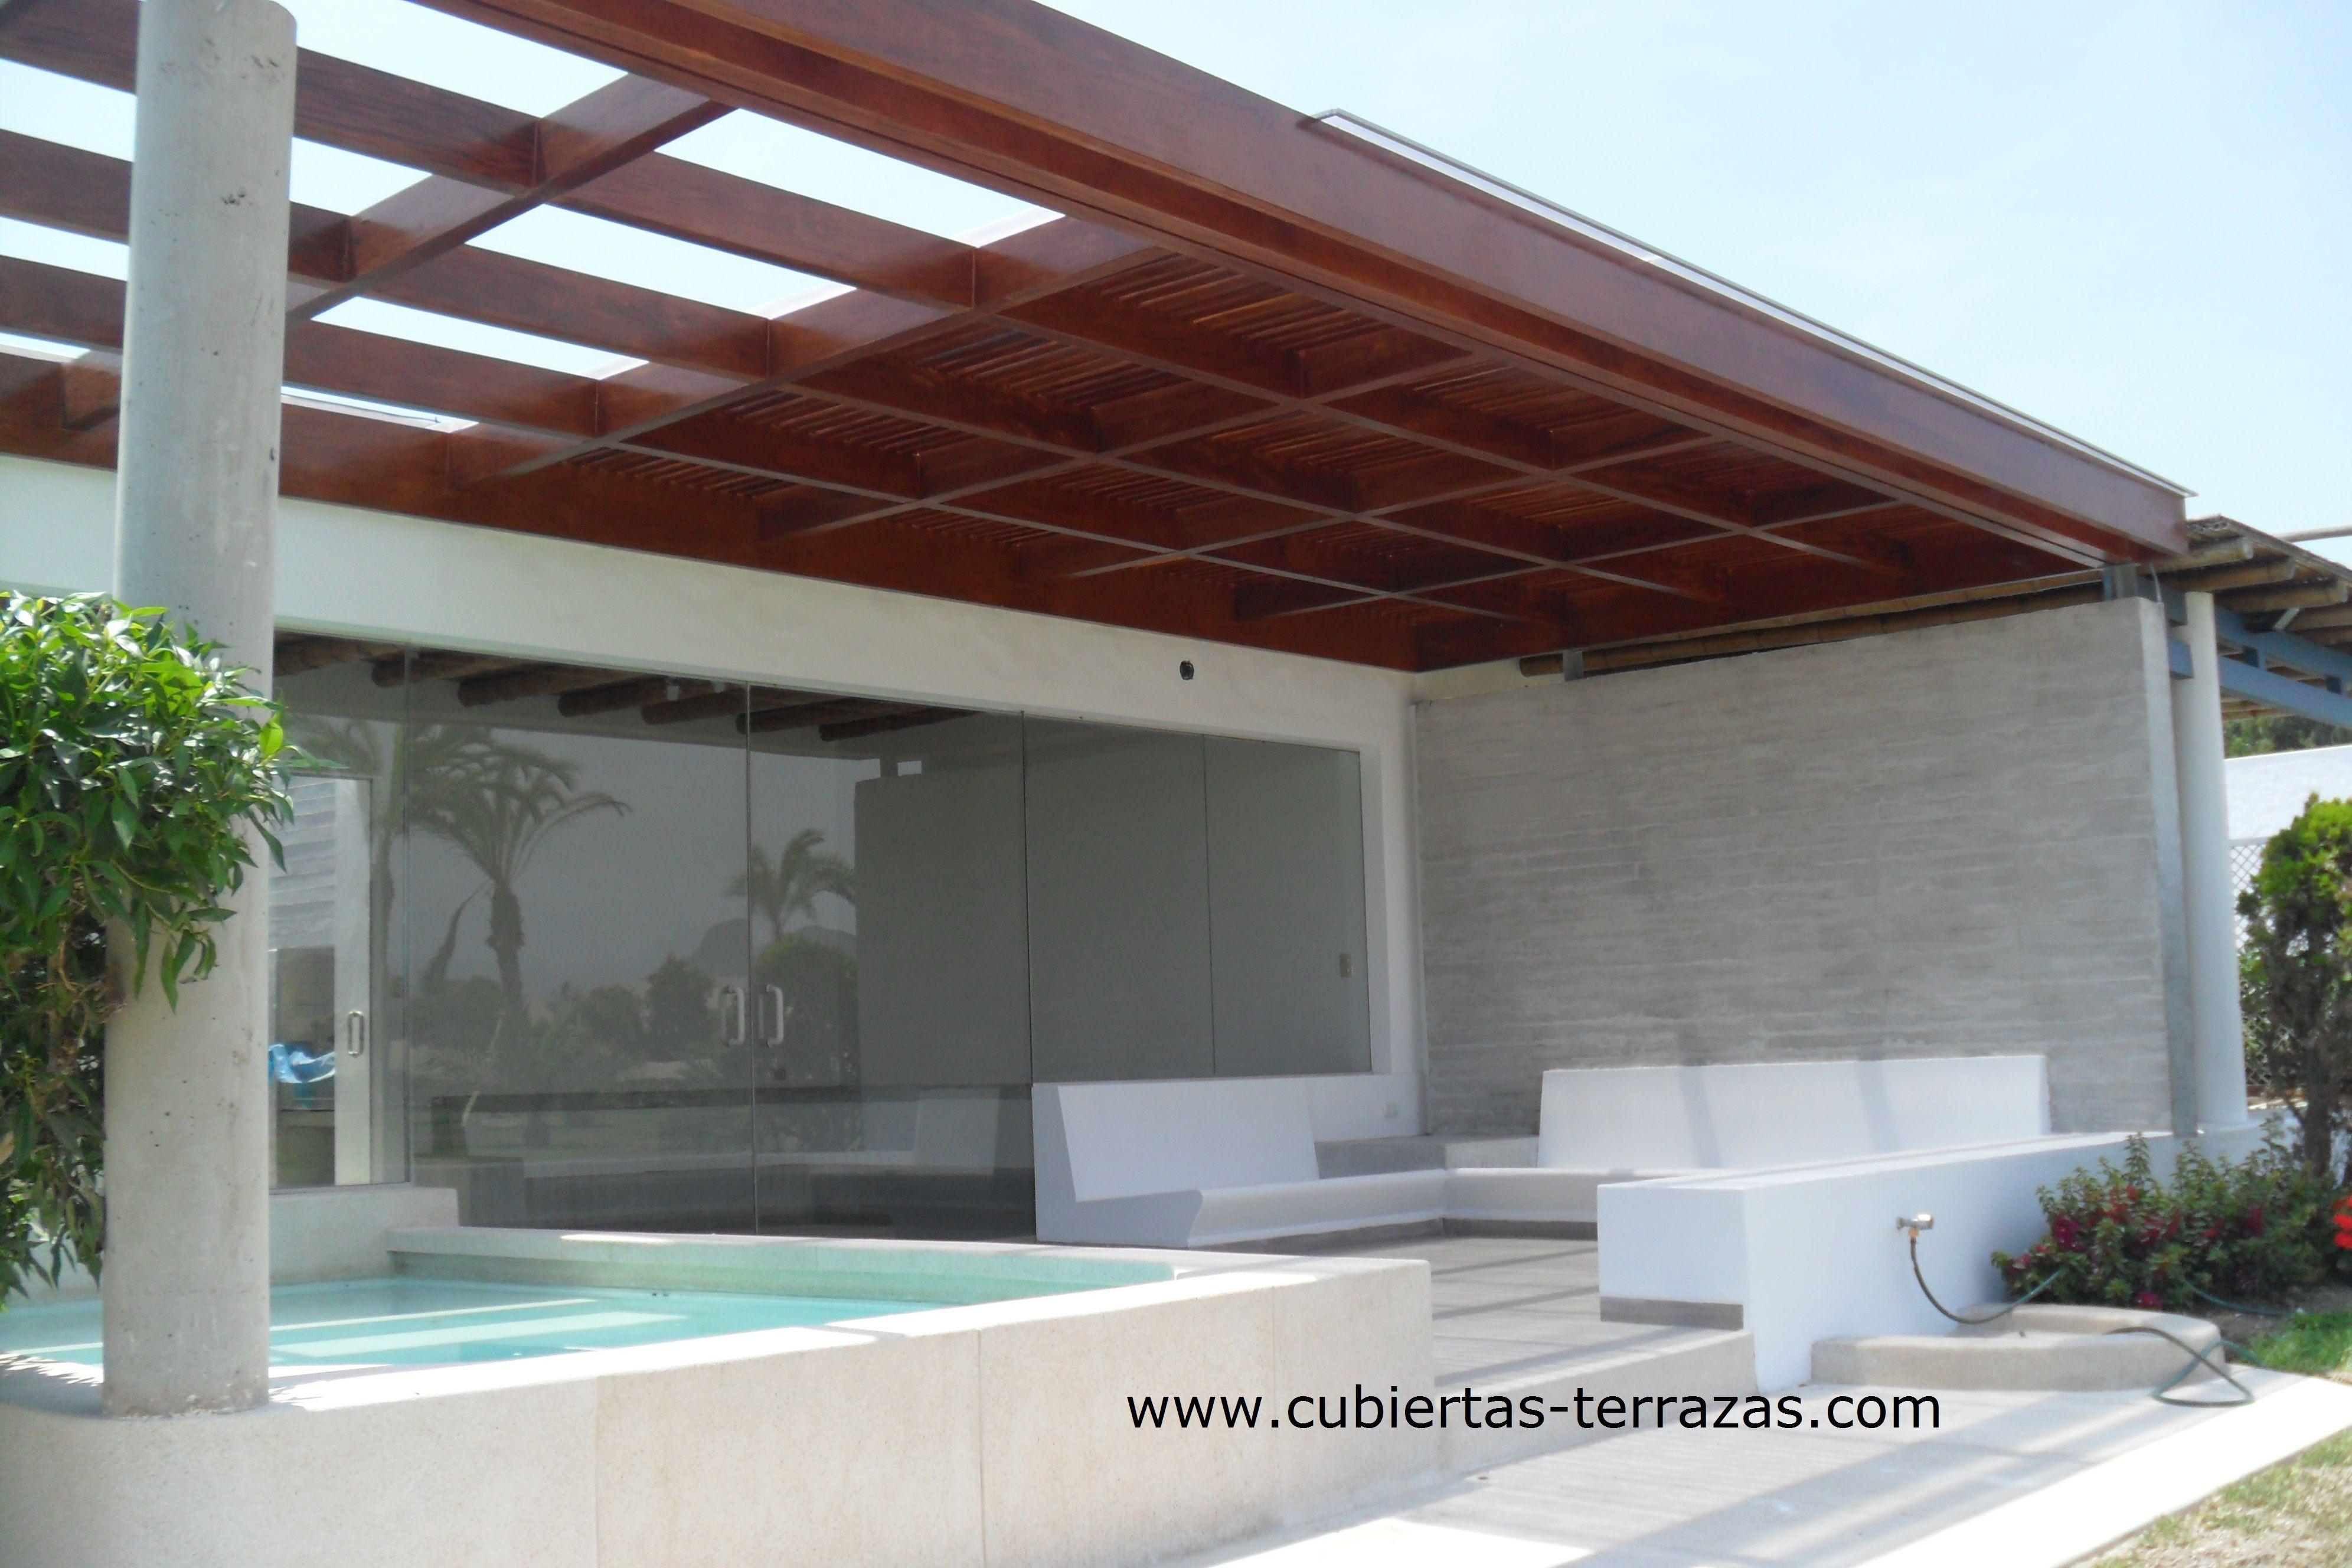 Techo de madera lacada con cubierta de policarbonato for Techos exteriores modernos